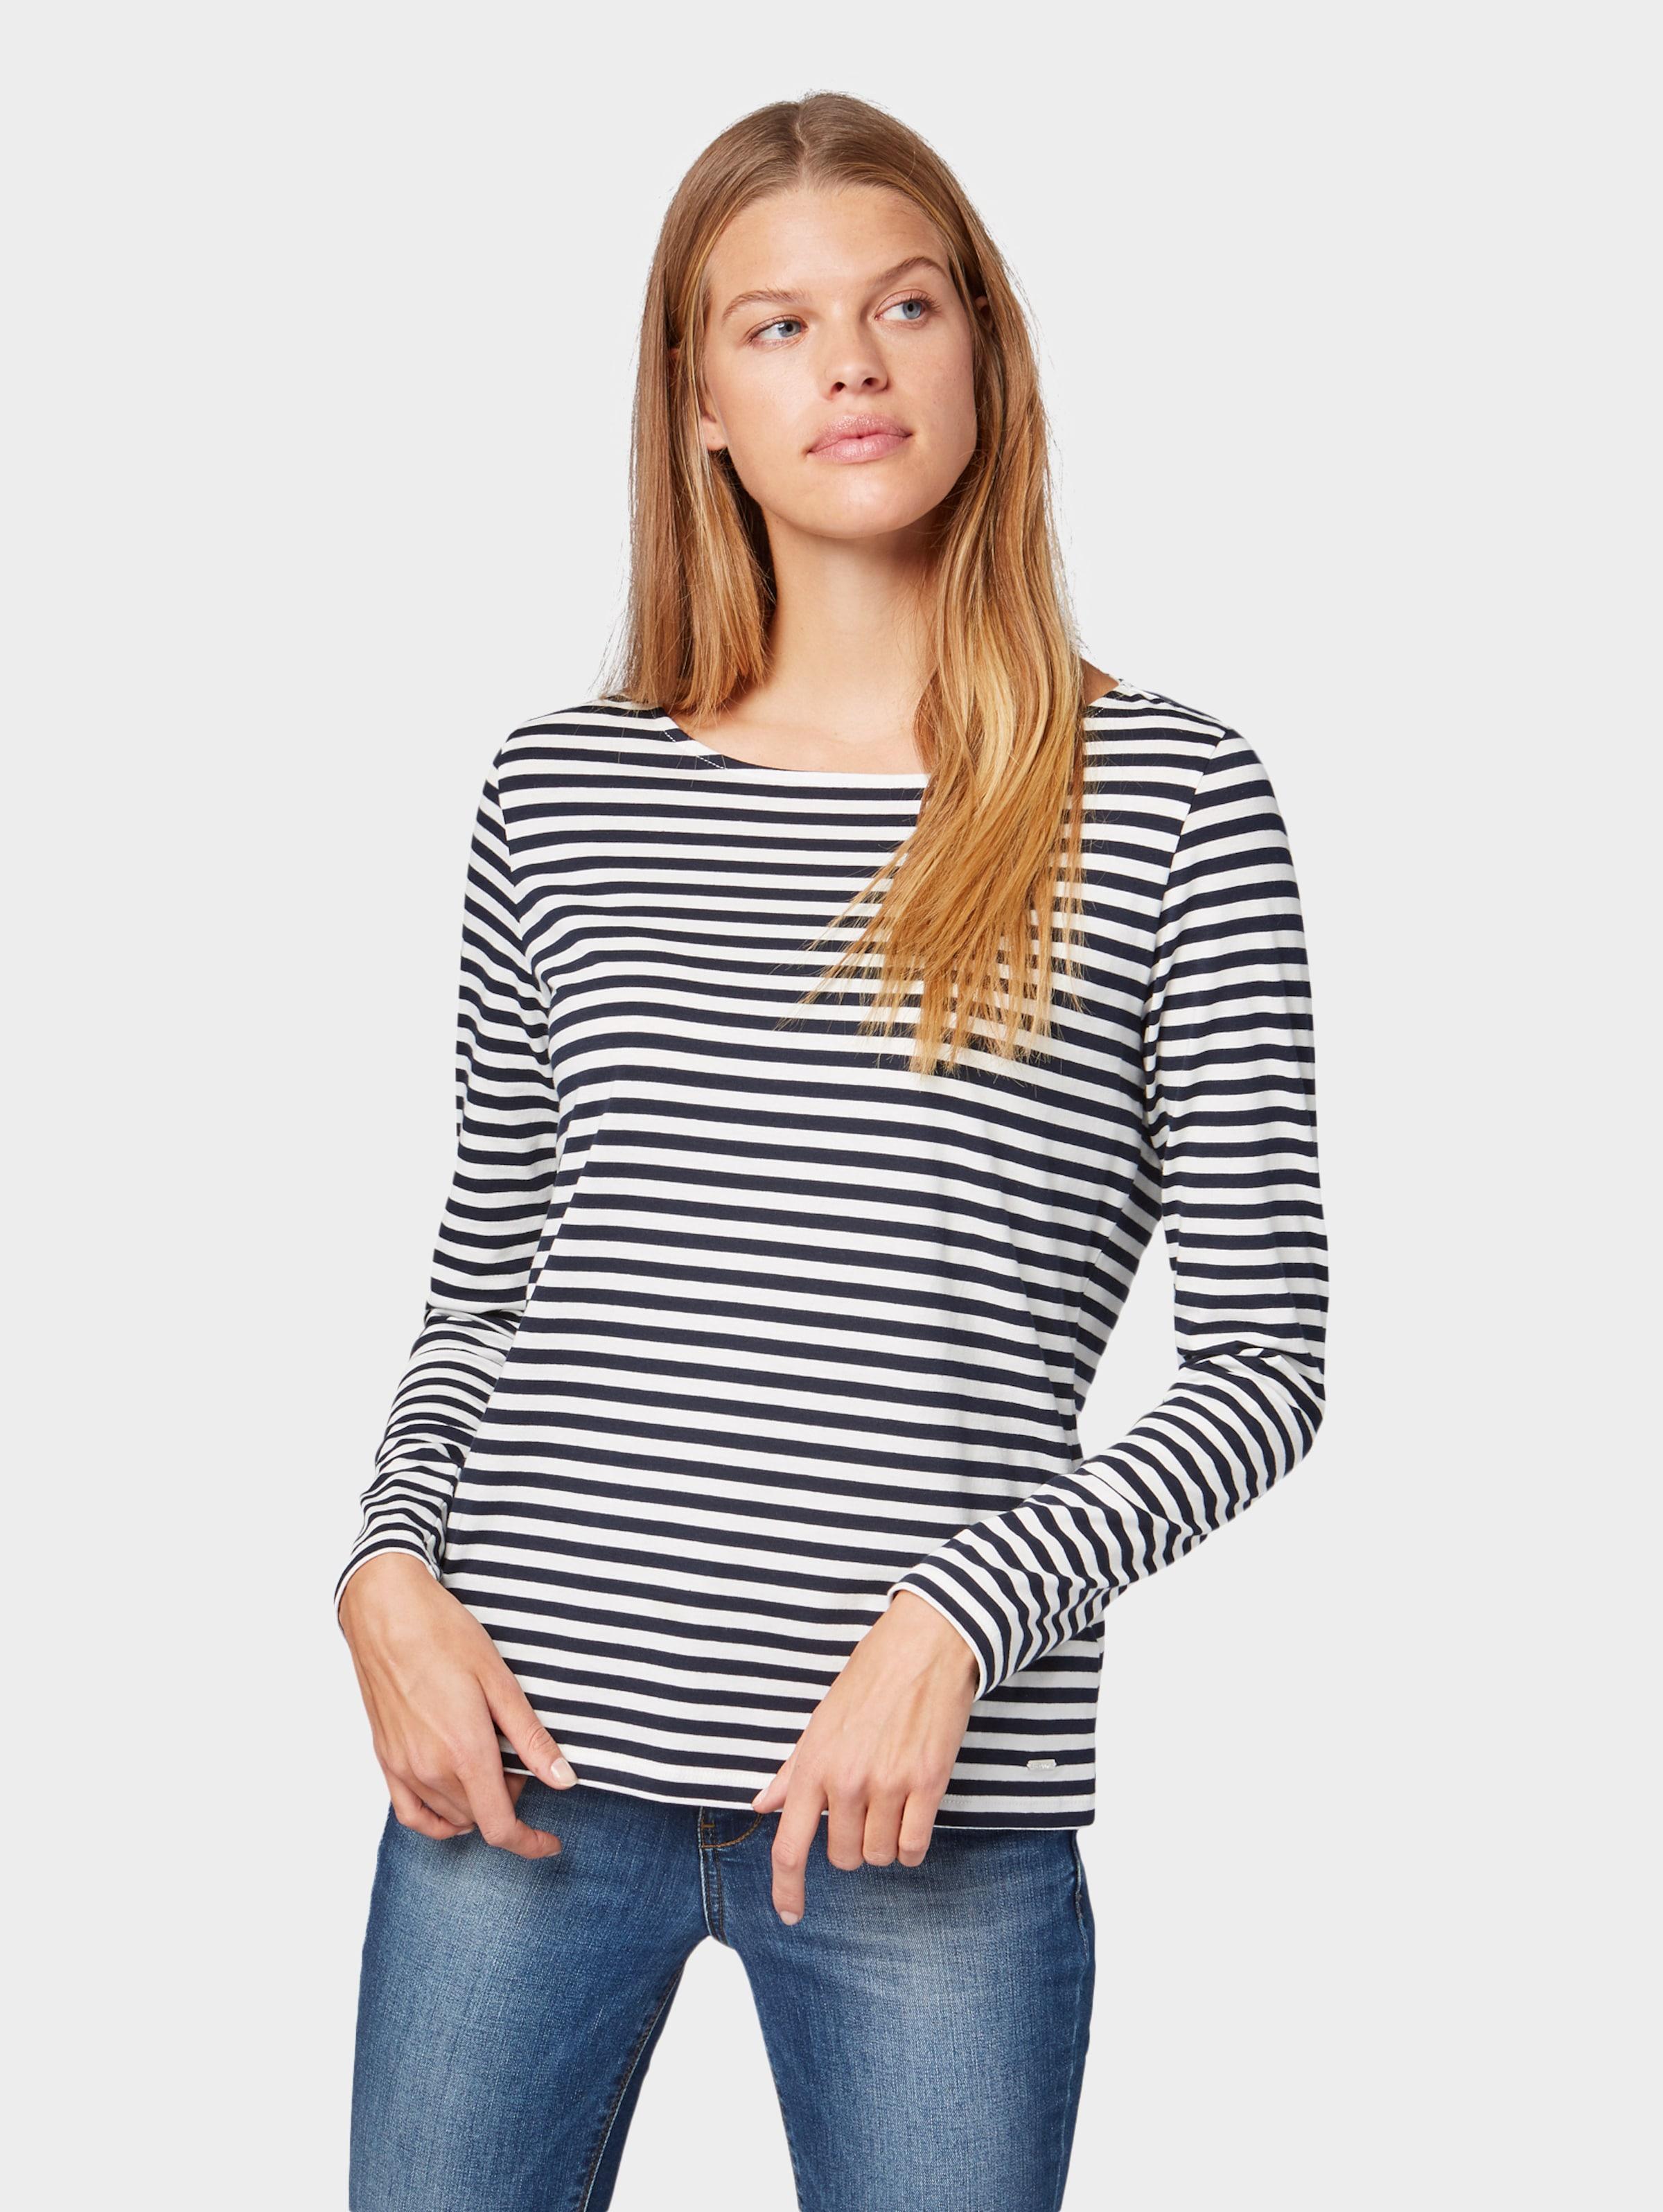 Blanc Tailor En BleuRouge Denim T shirt Tom pzVSMU